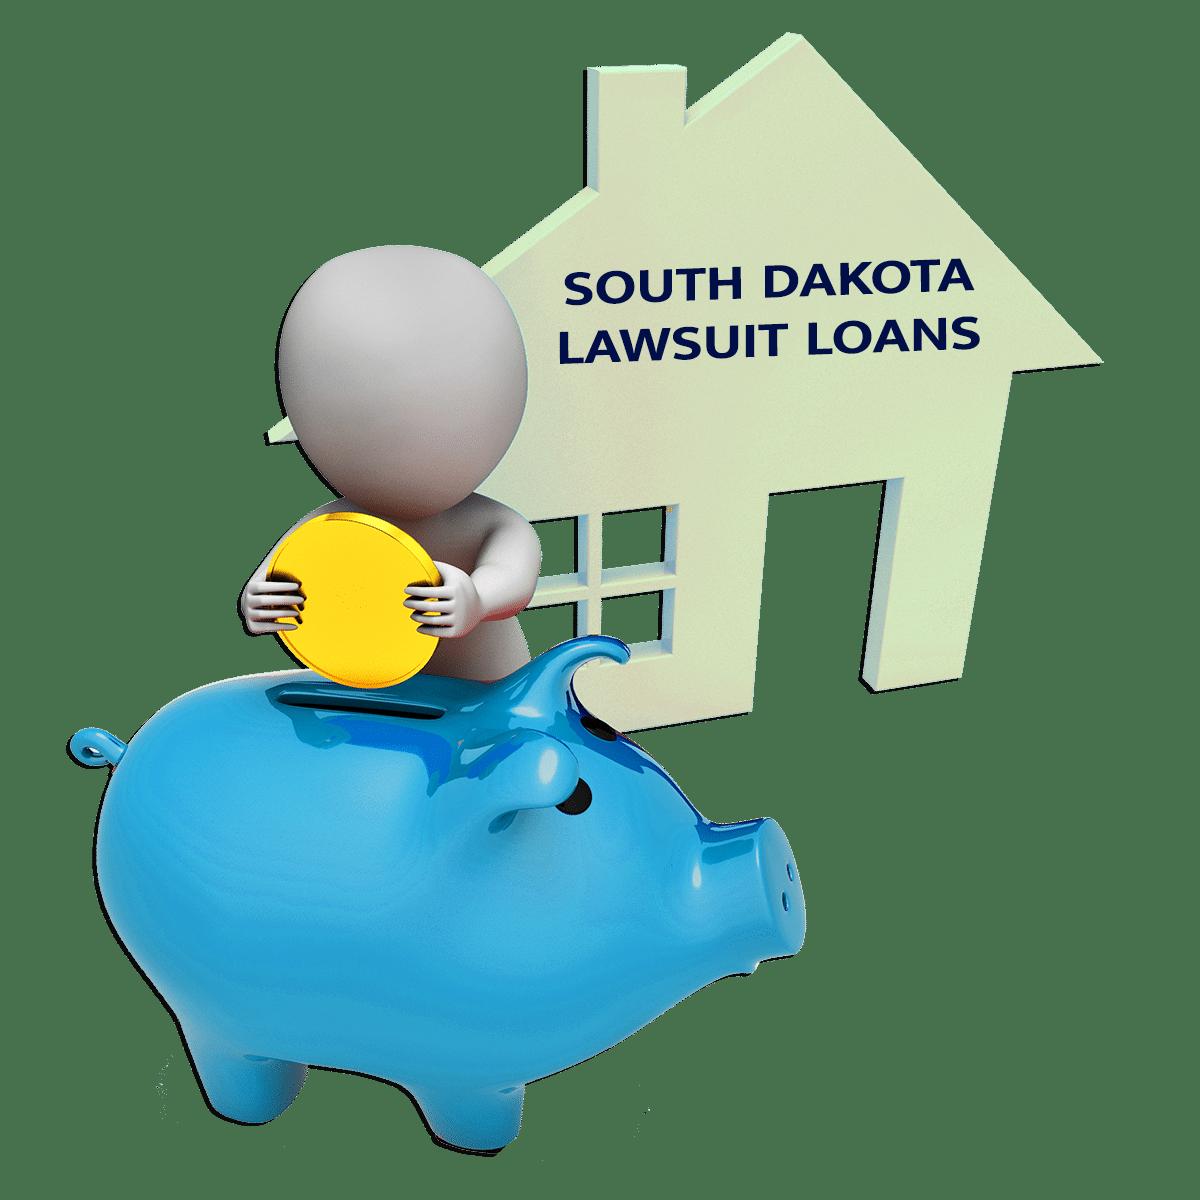 South Dakota lawsuit loans